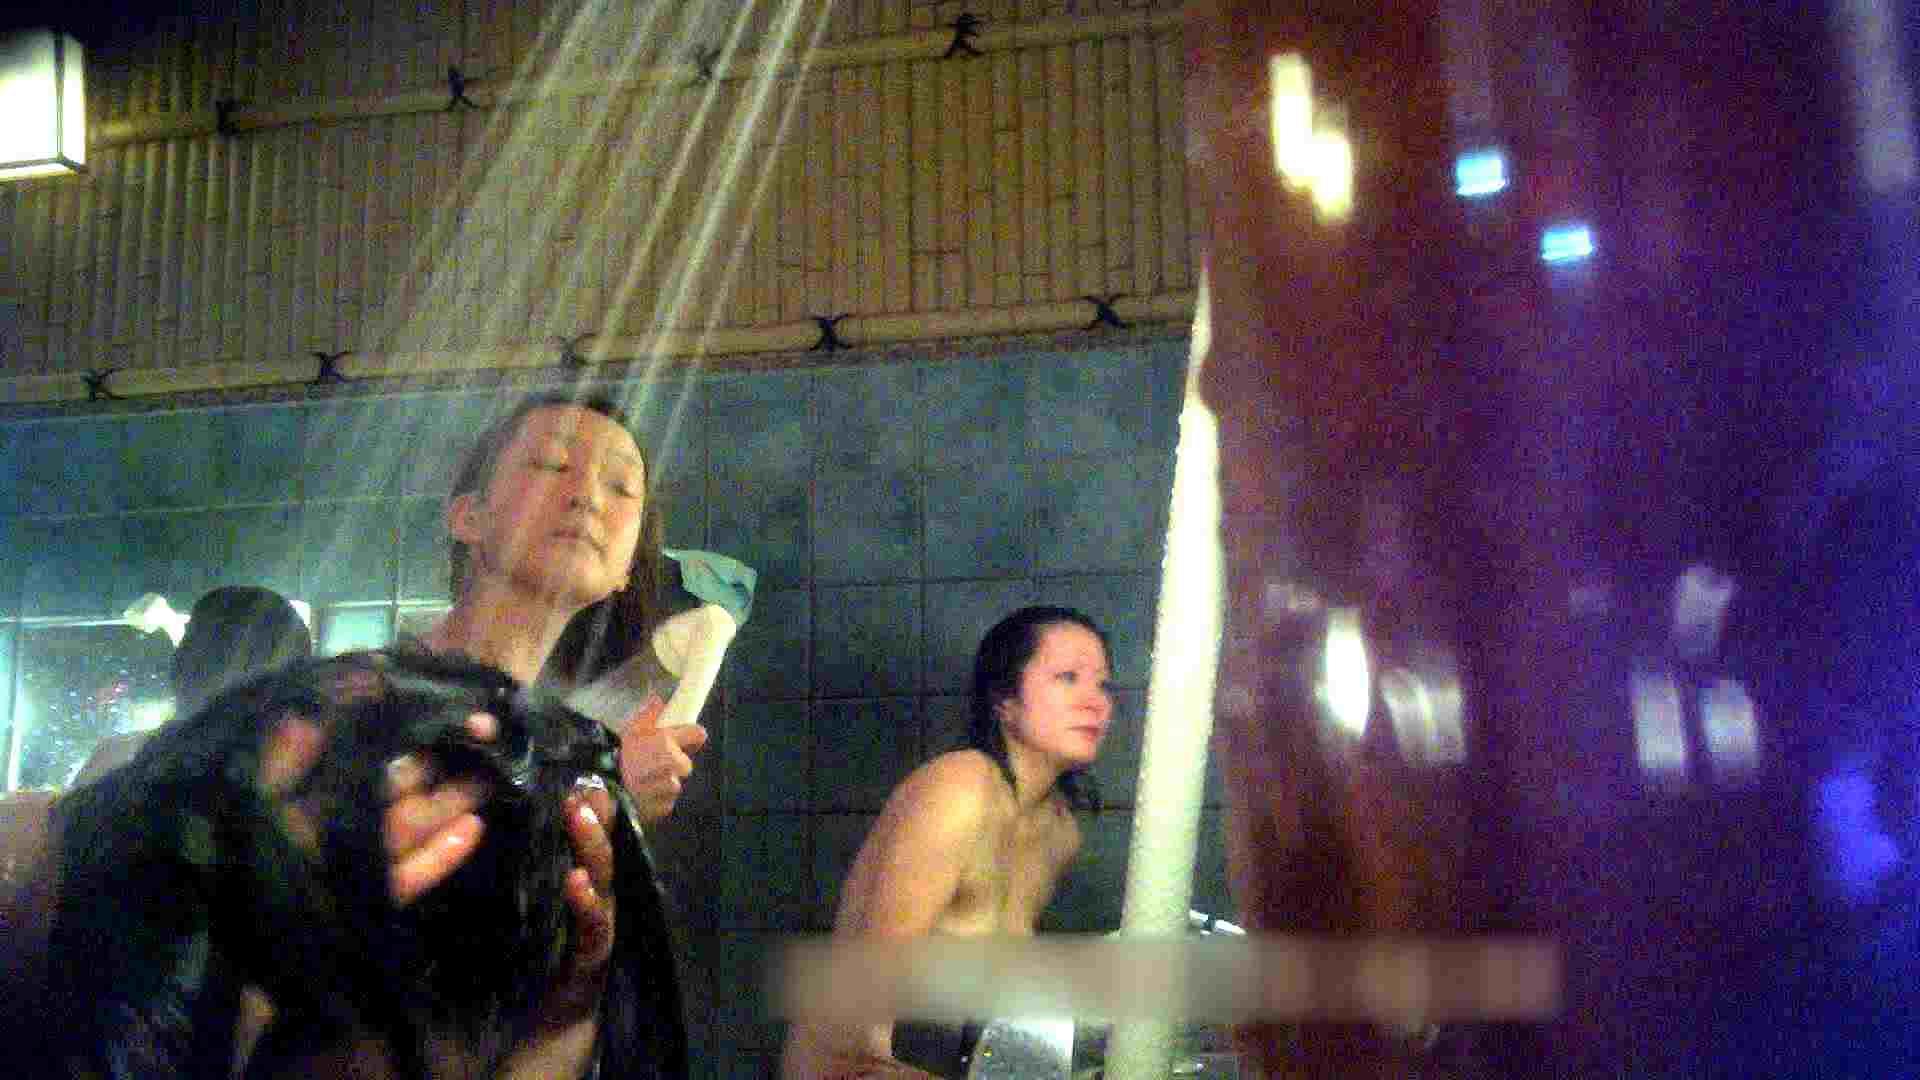 TG.12 【上等兵】いやぁ若い!ぷっちぷちギャル!でも時間短い・・・ 貧乳 オメコ無修正動画無料 43画像 22